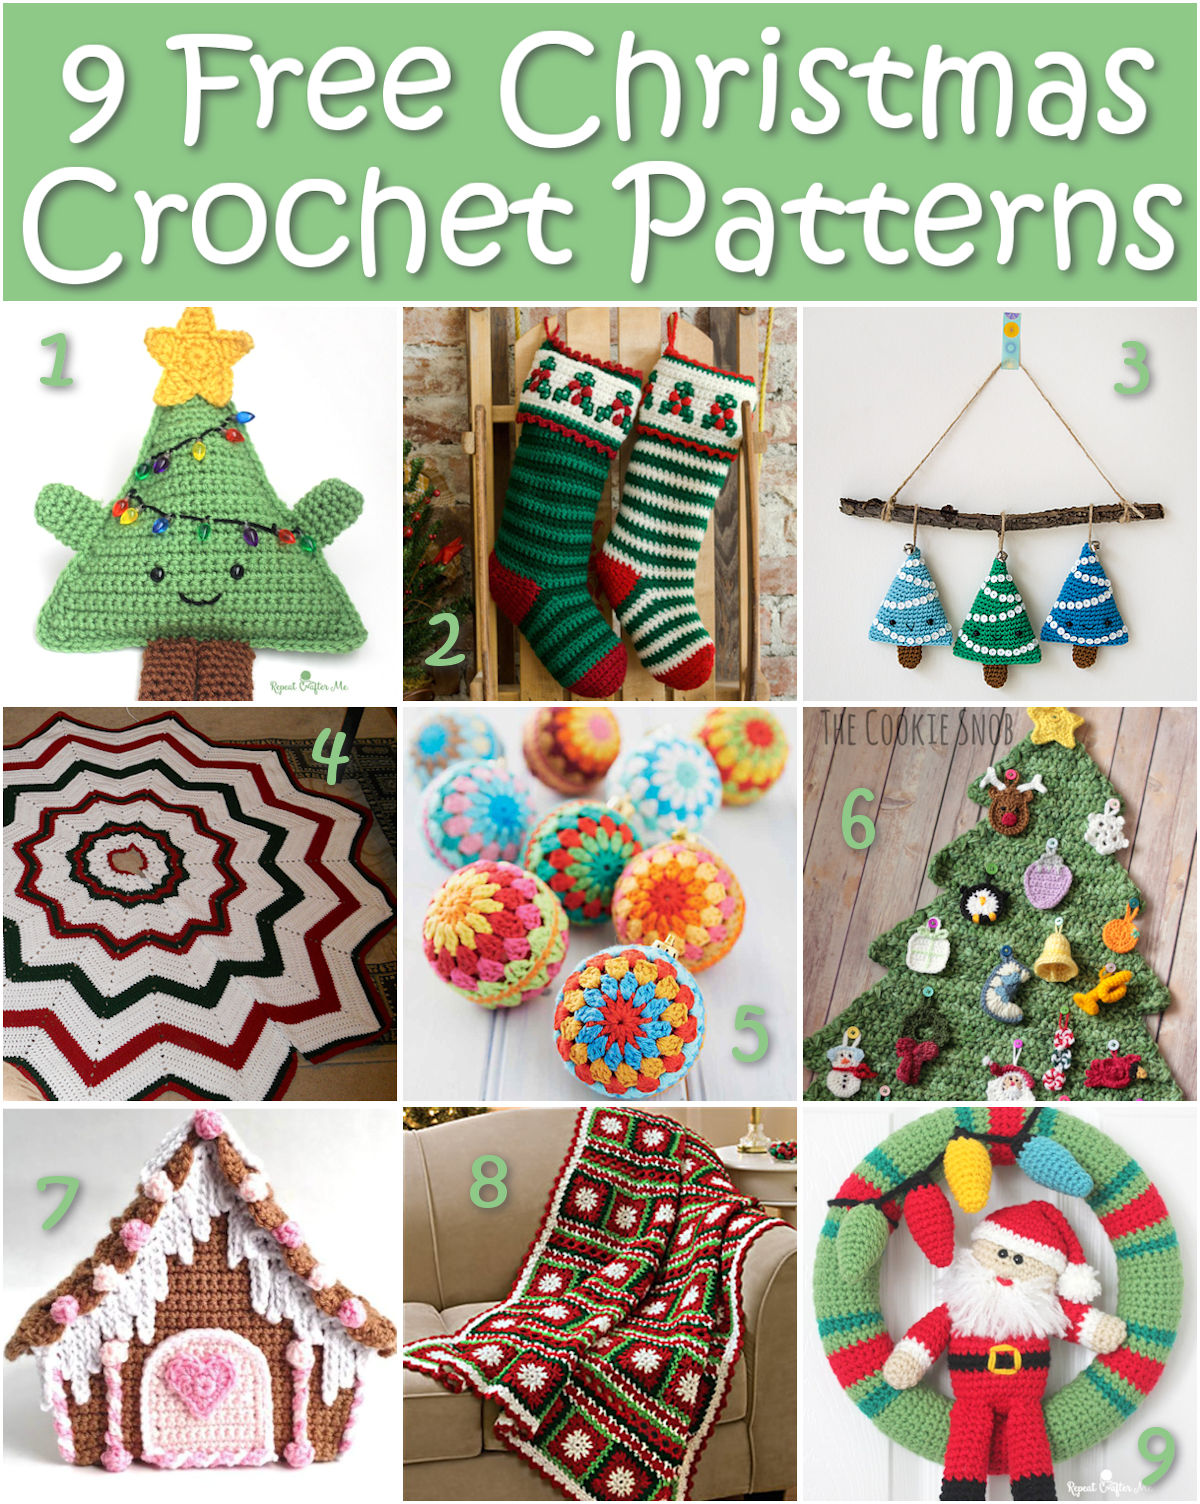 Free Christmas Crochet Patterns.9 Free Christmas Crochet Patterns